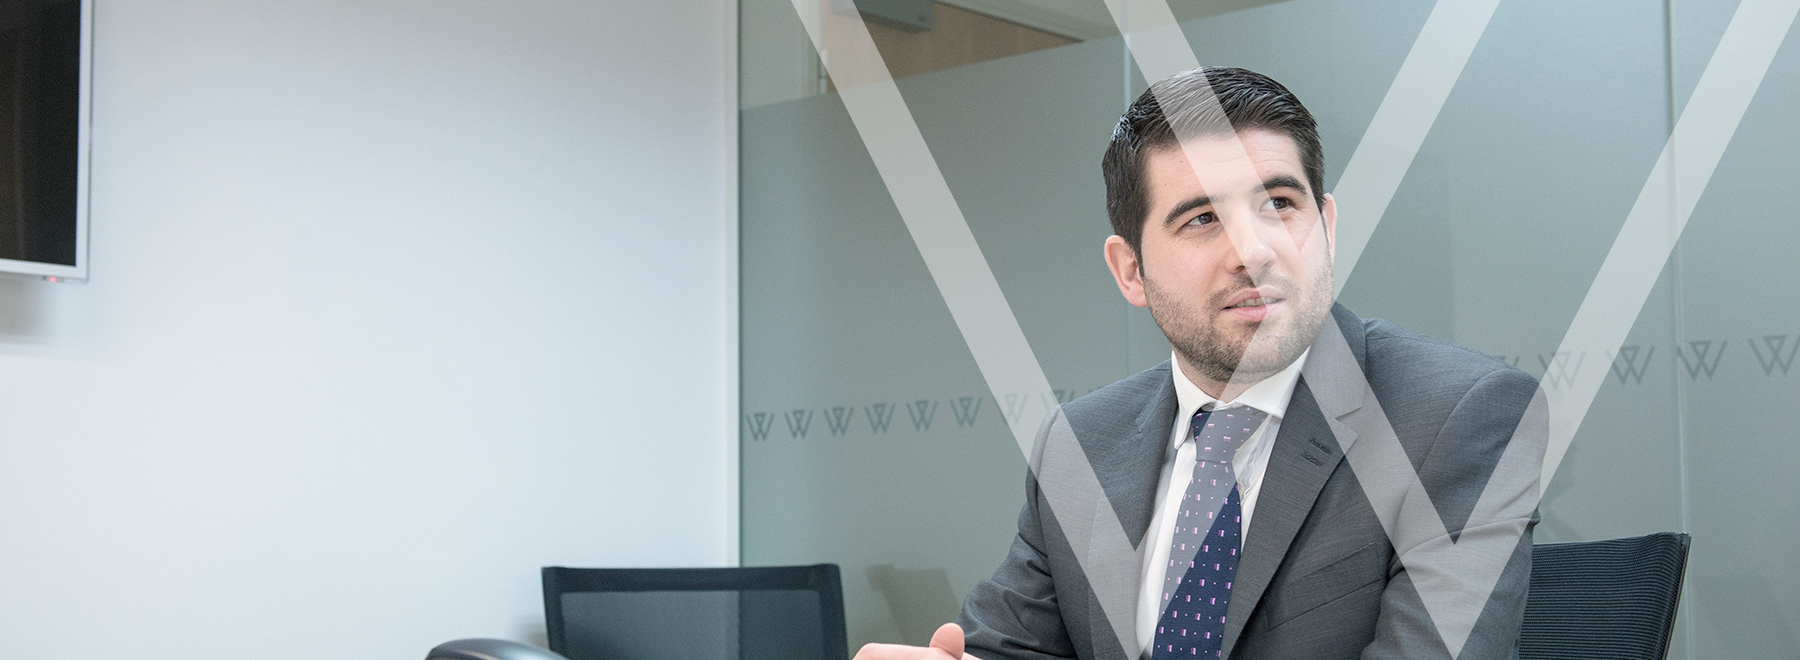 Dan James, Transaction Services Director, Wilson Partners.